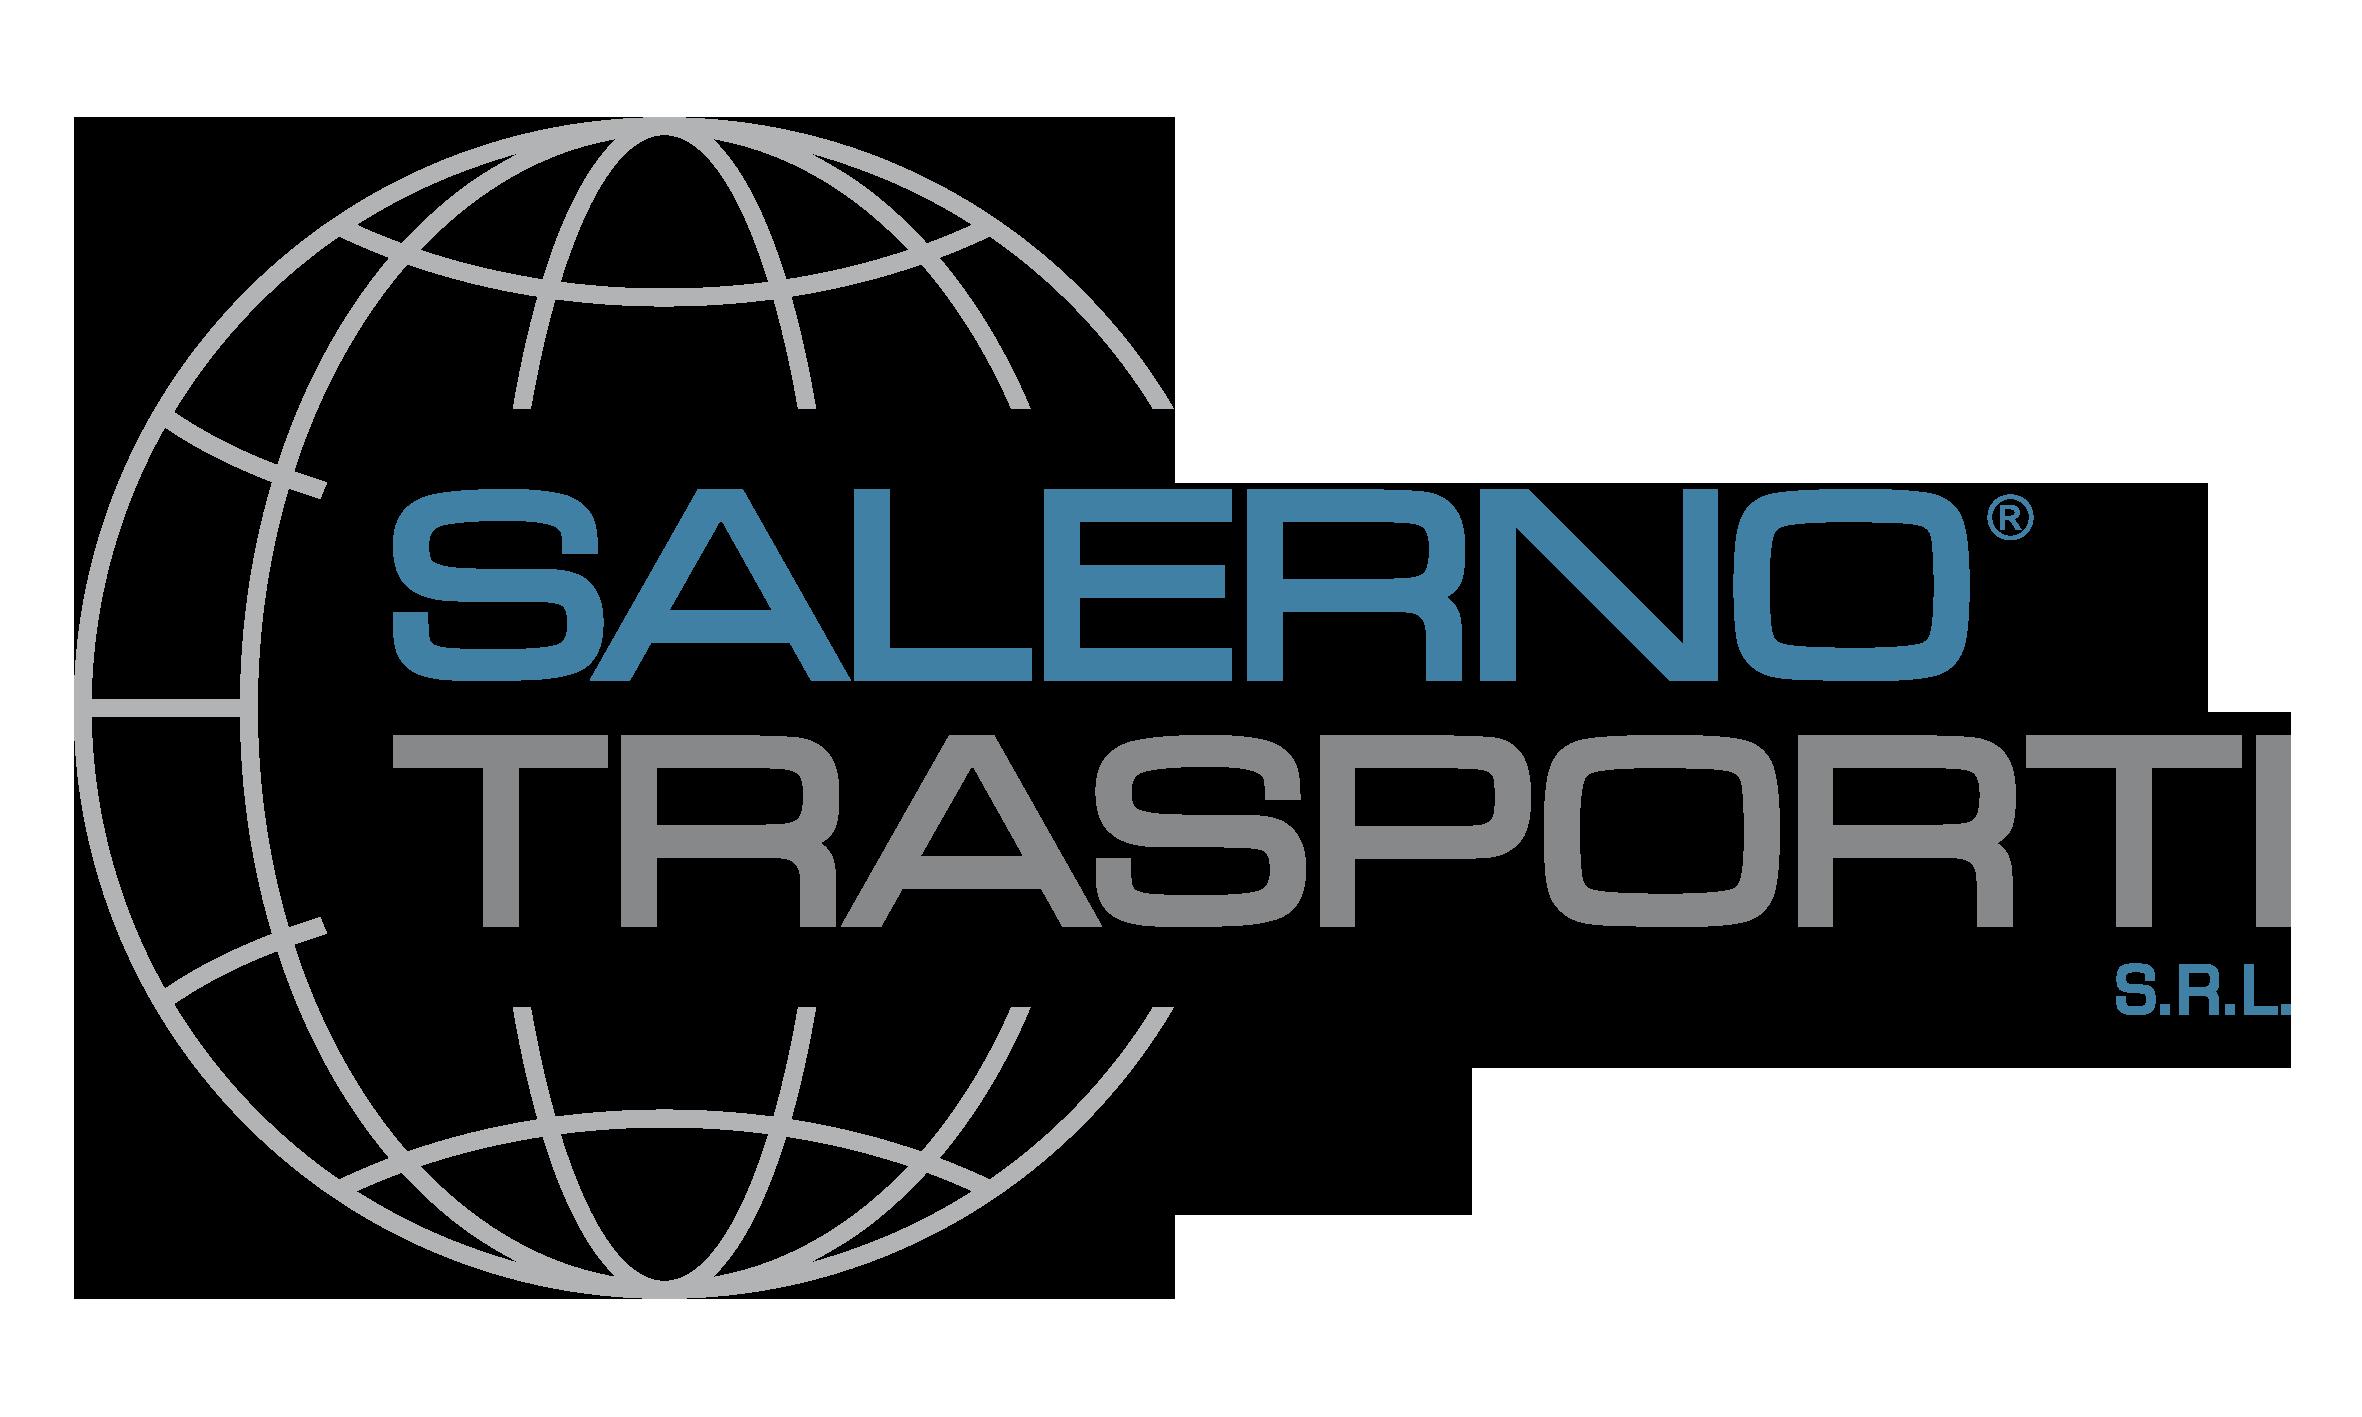 LOGO Salerno Trasporti